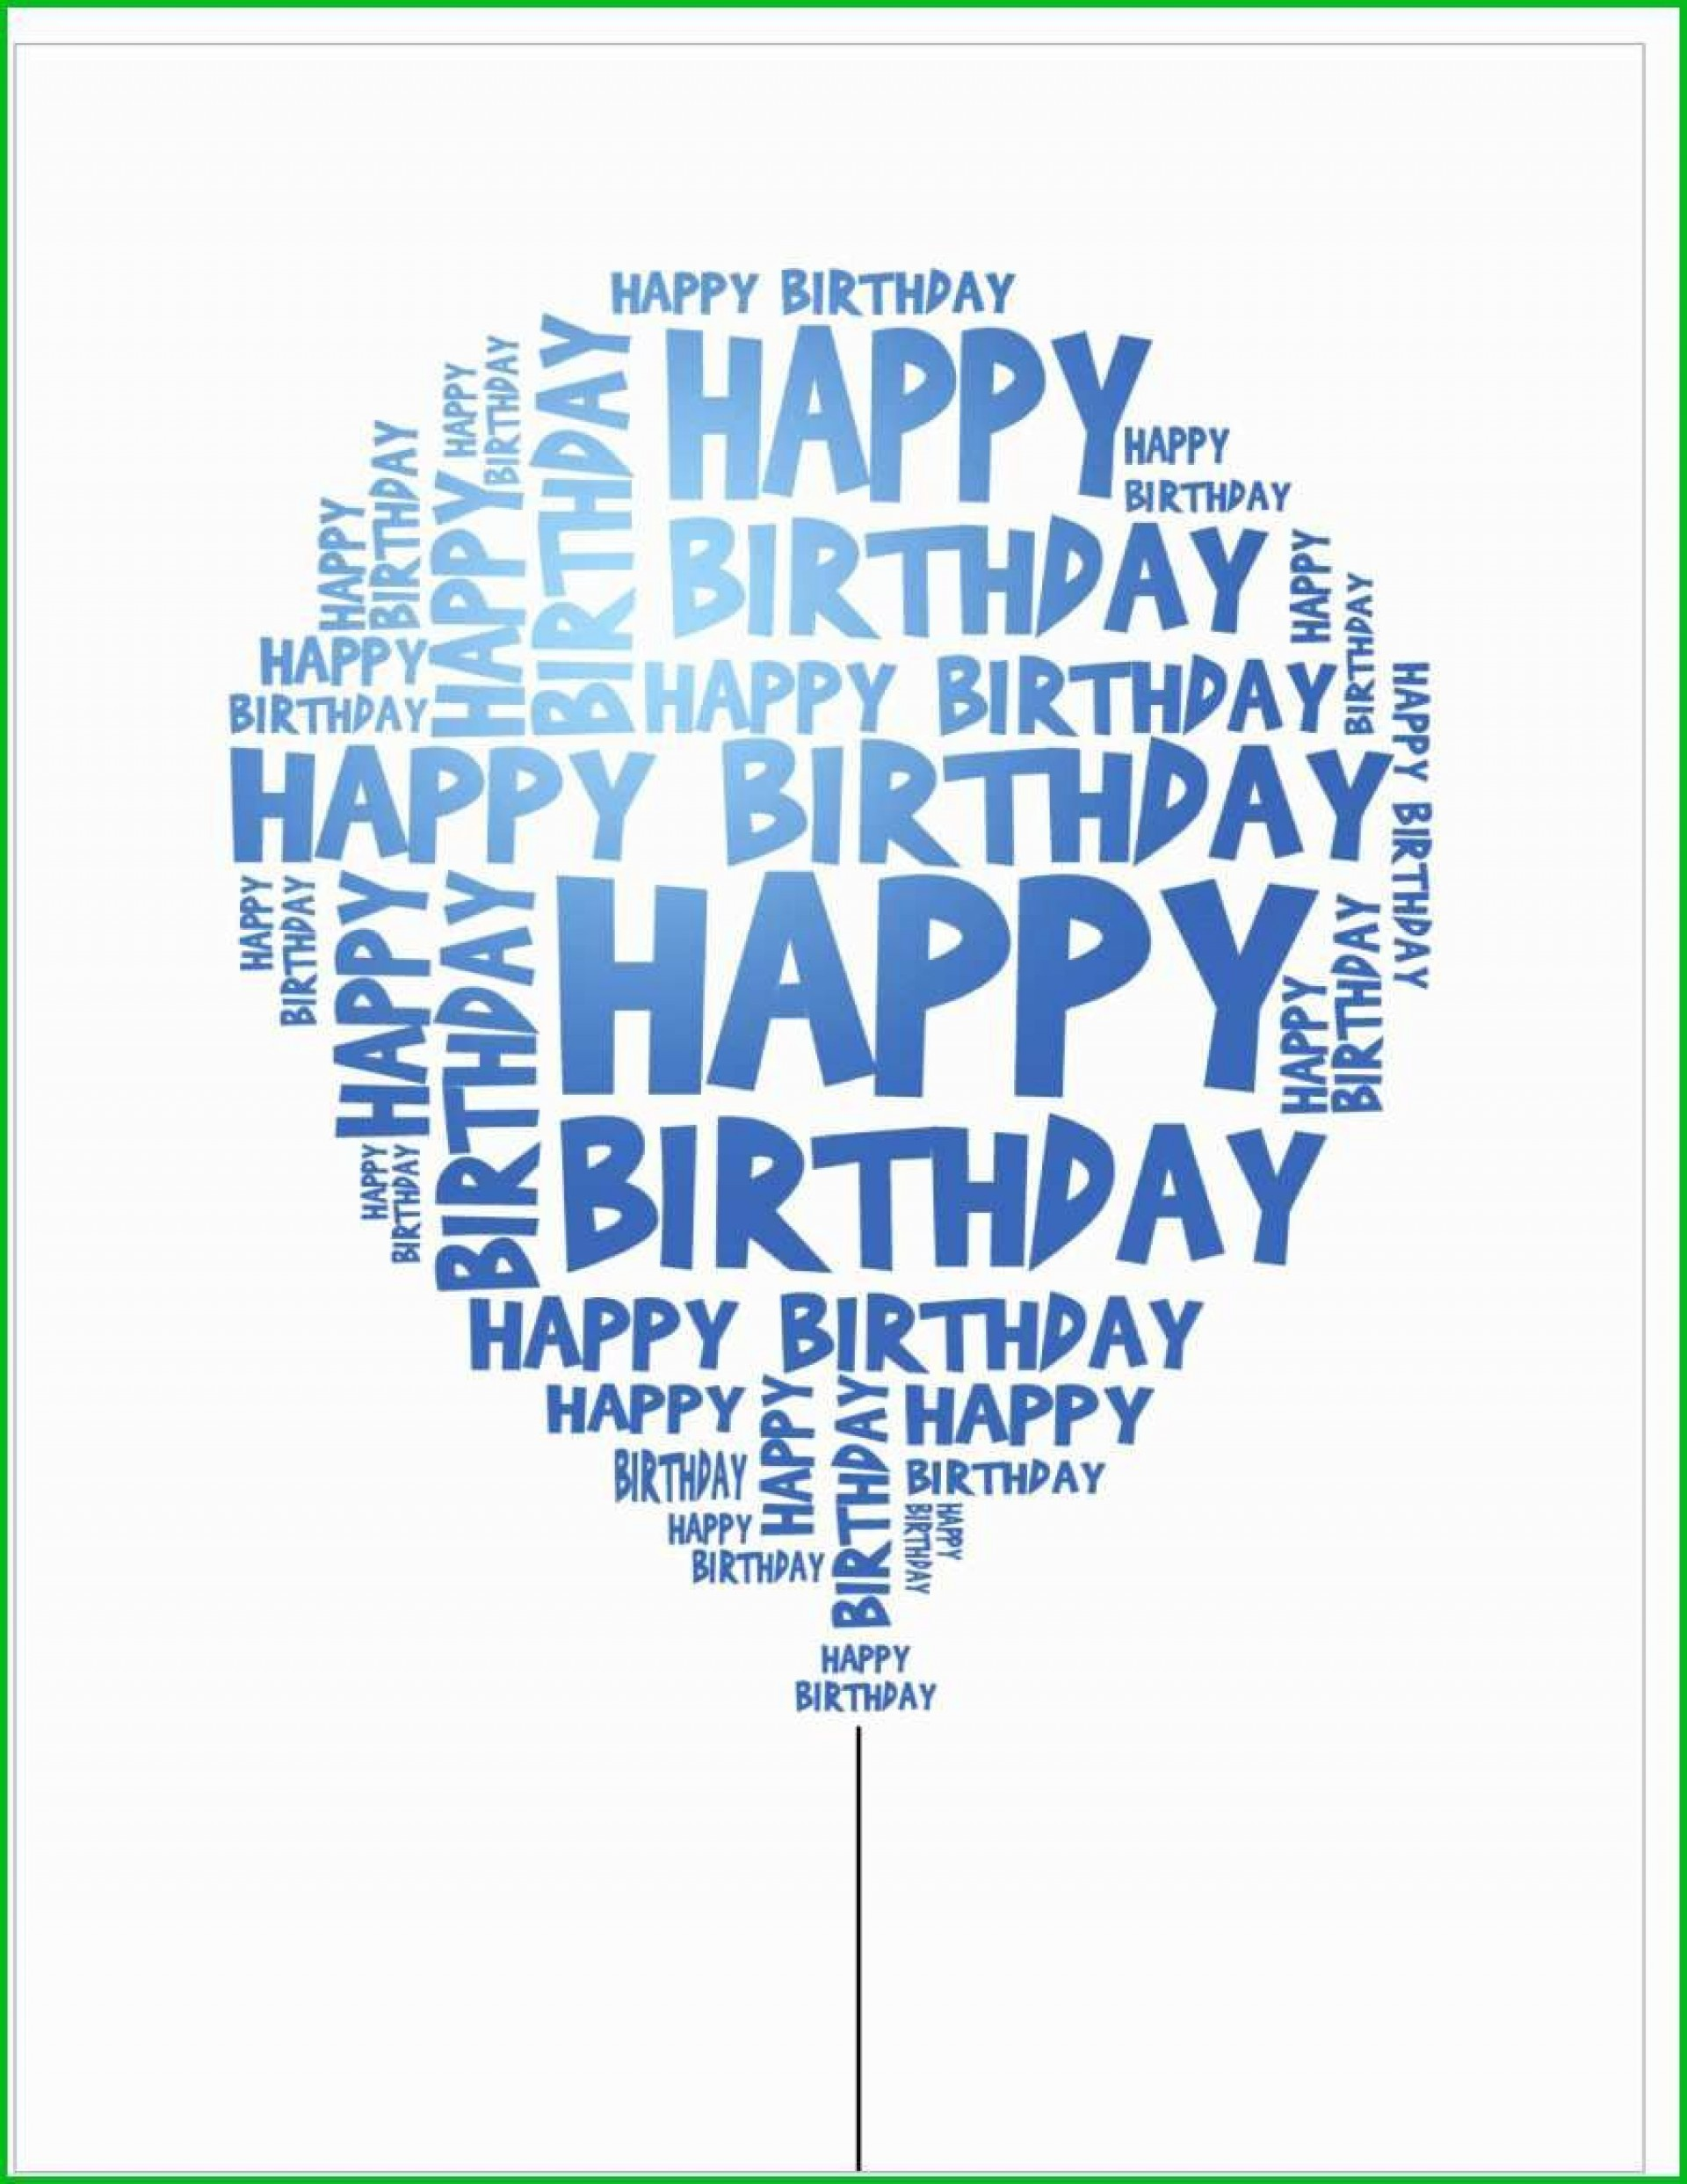 004 Fantastic Happy Birthday Card Template For Word Idea 1920